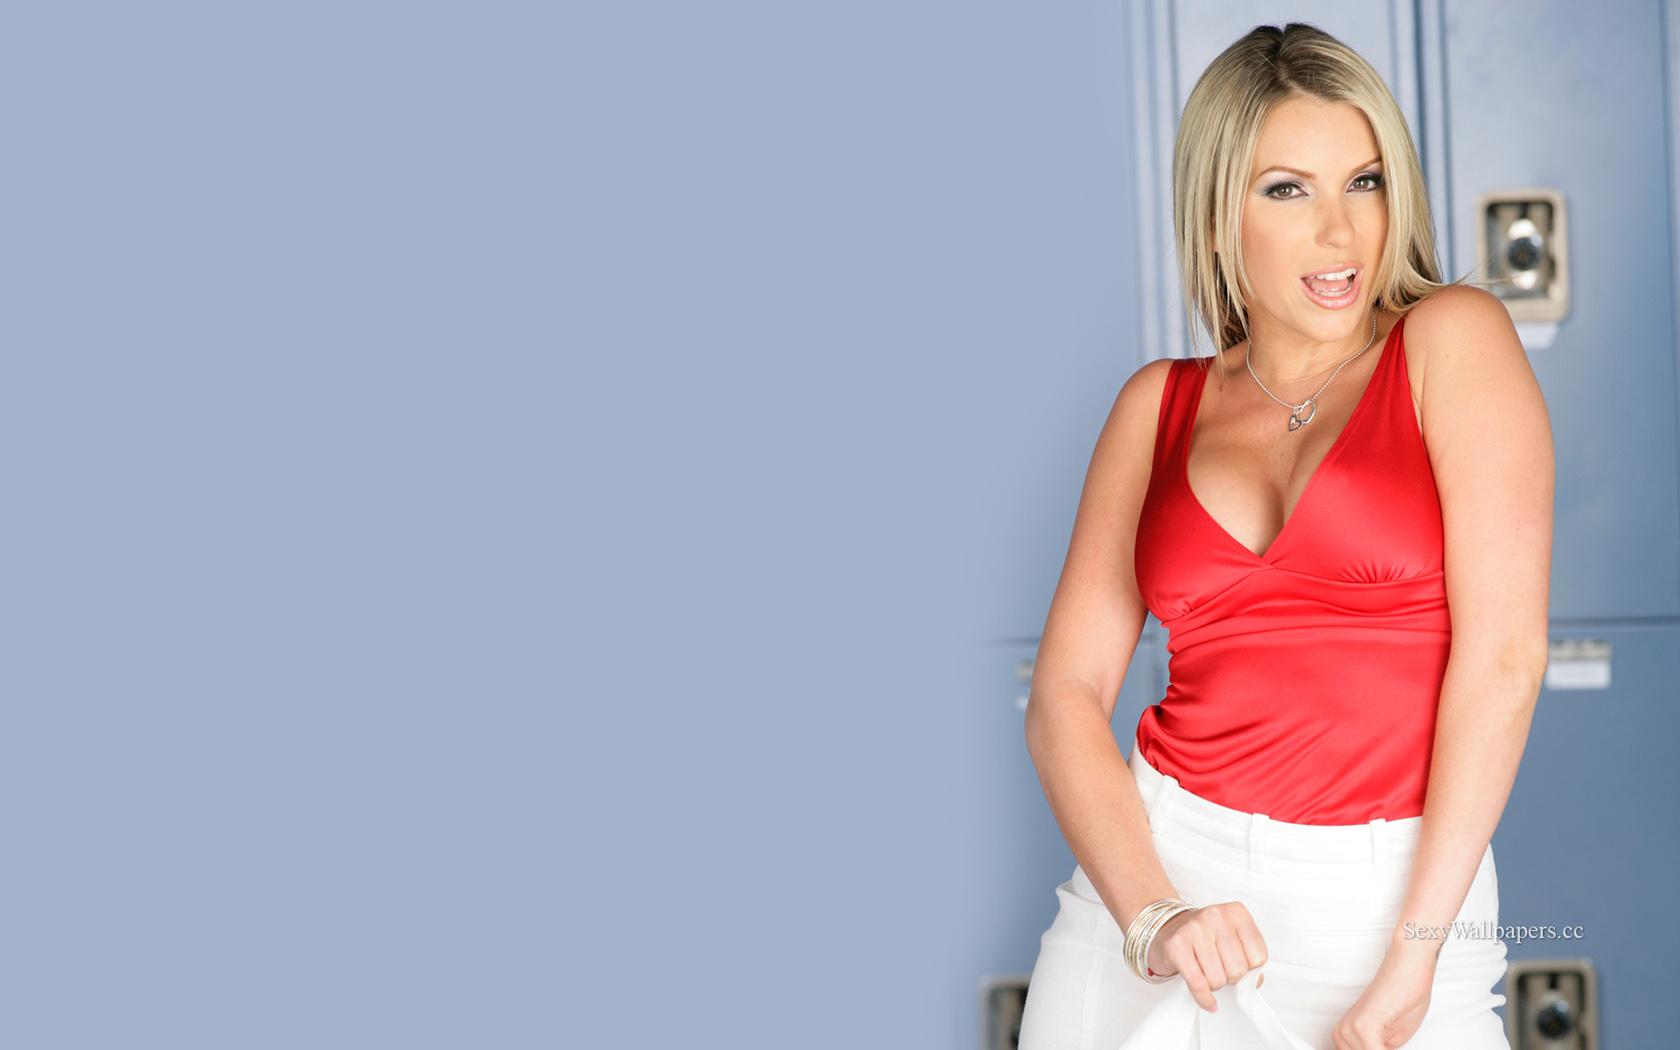 Courtney Cummz sexy wallpaper 1680x1050